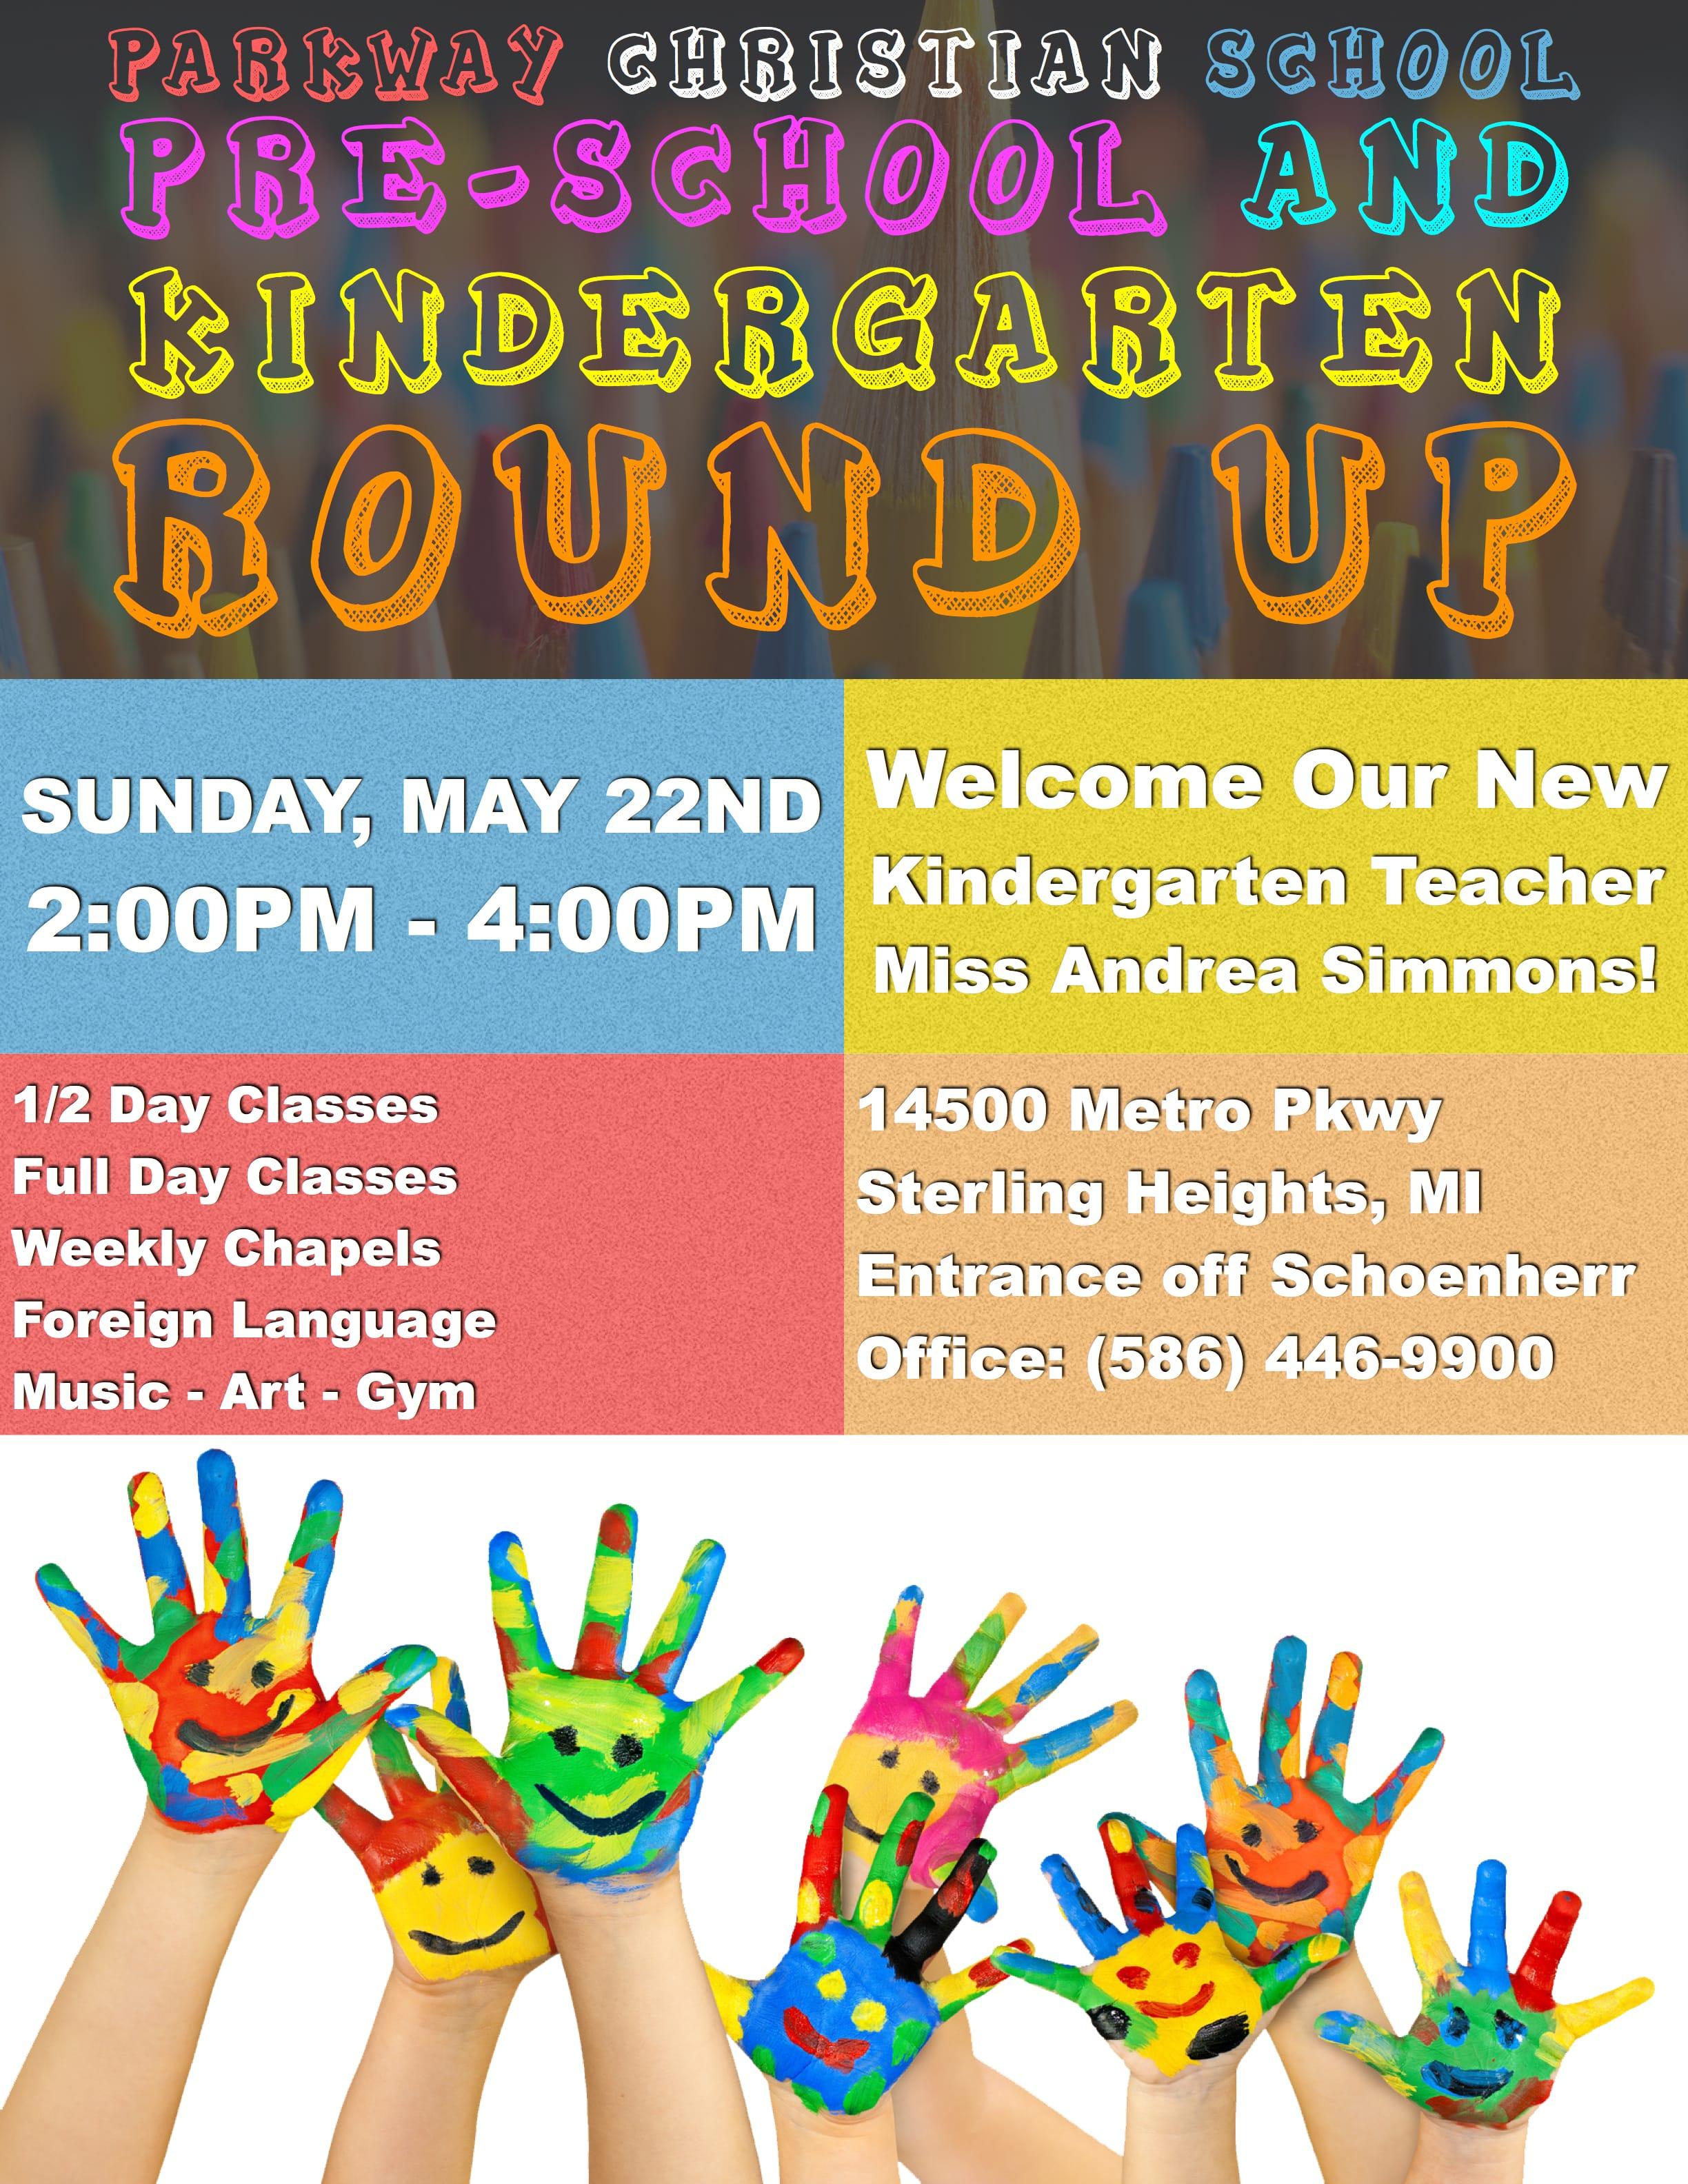 Pre-School & Kindergarten Round Up